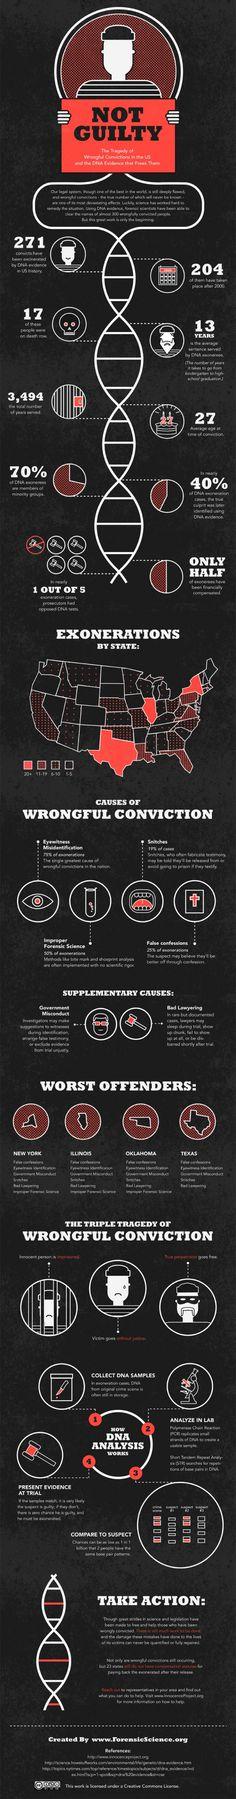 Evolution of DNA Evidence for Crime Solving - A Judicial and Legislative History